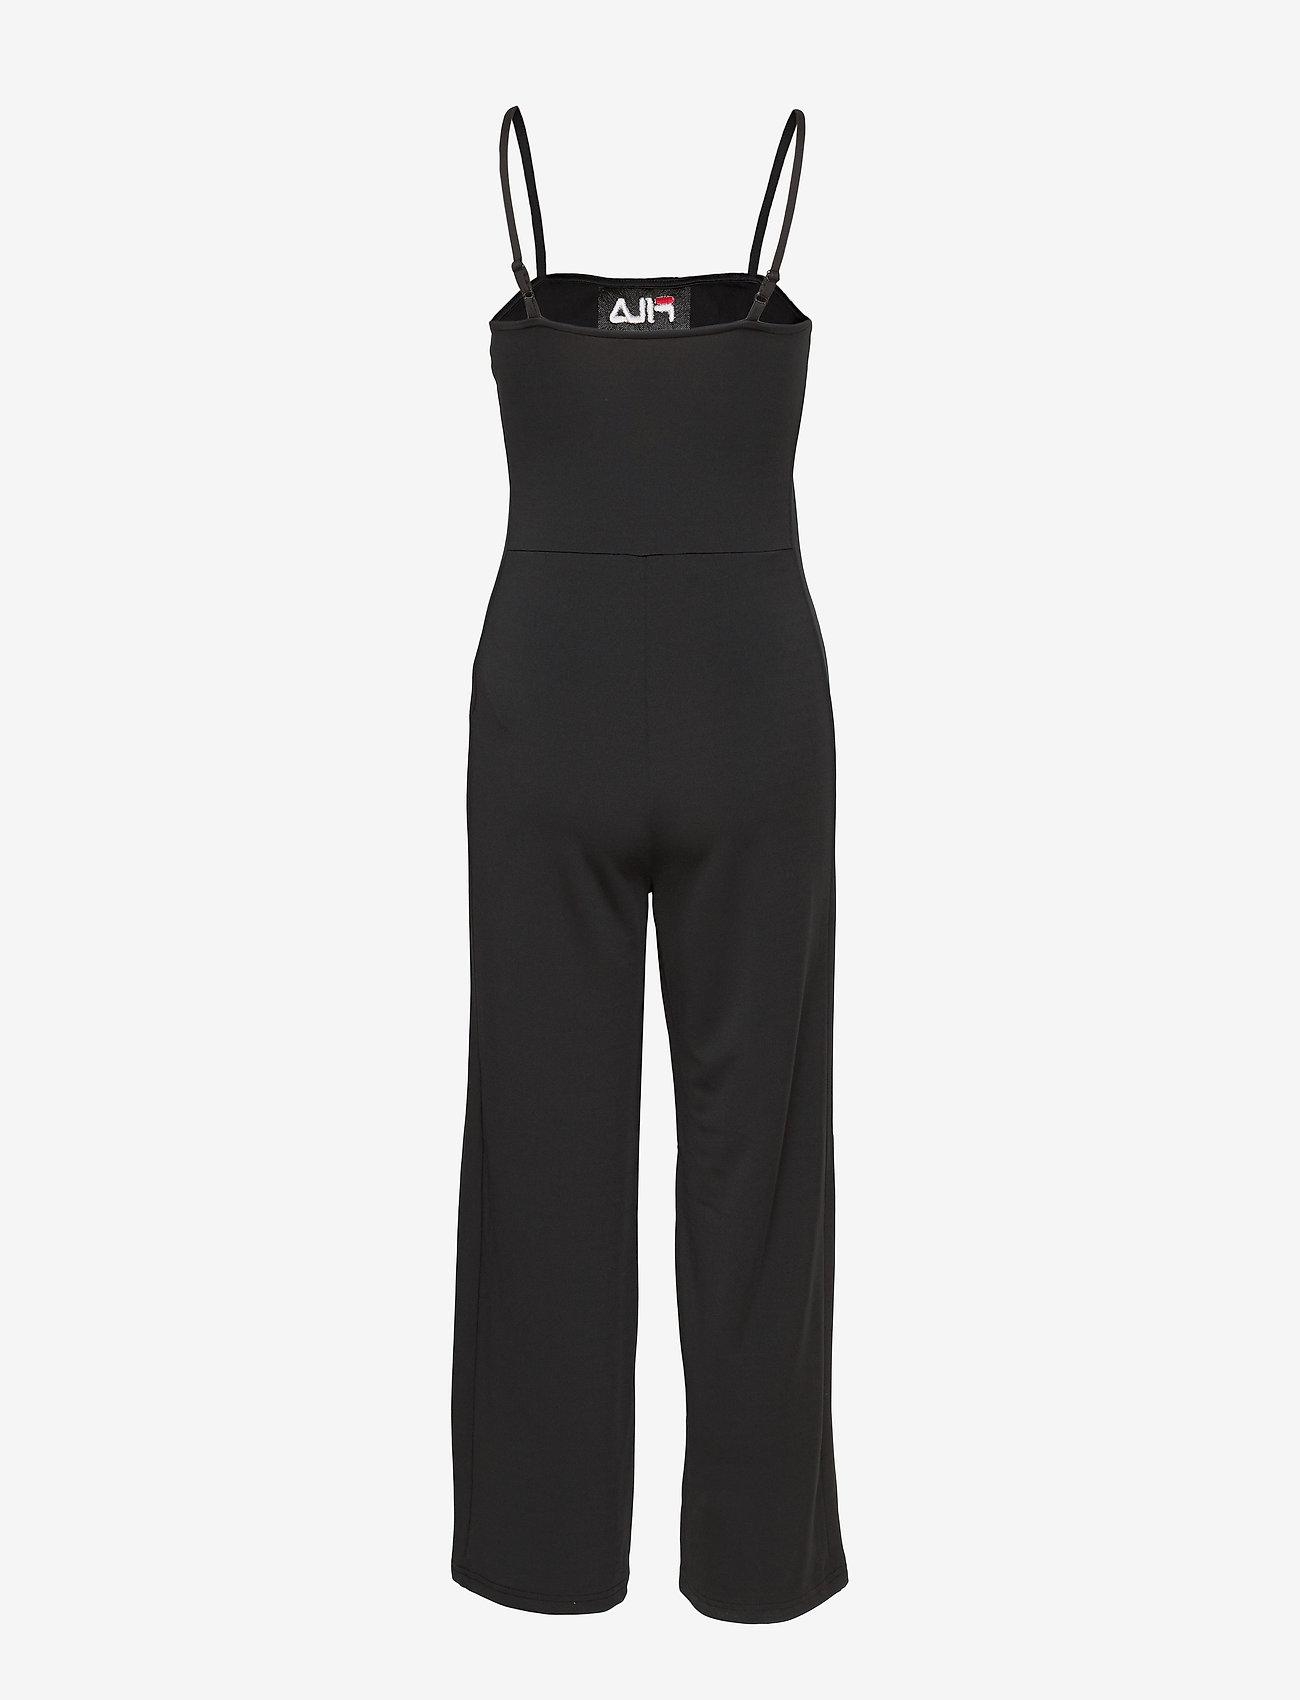 FILA - WOMEN TANUJA jumpsuit - 7/8 length - sportieve tops - black - 1